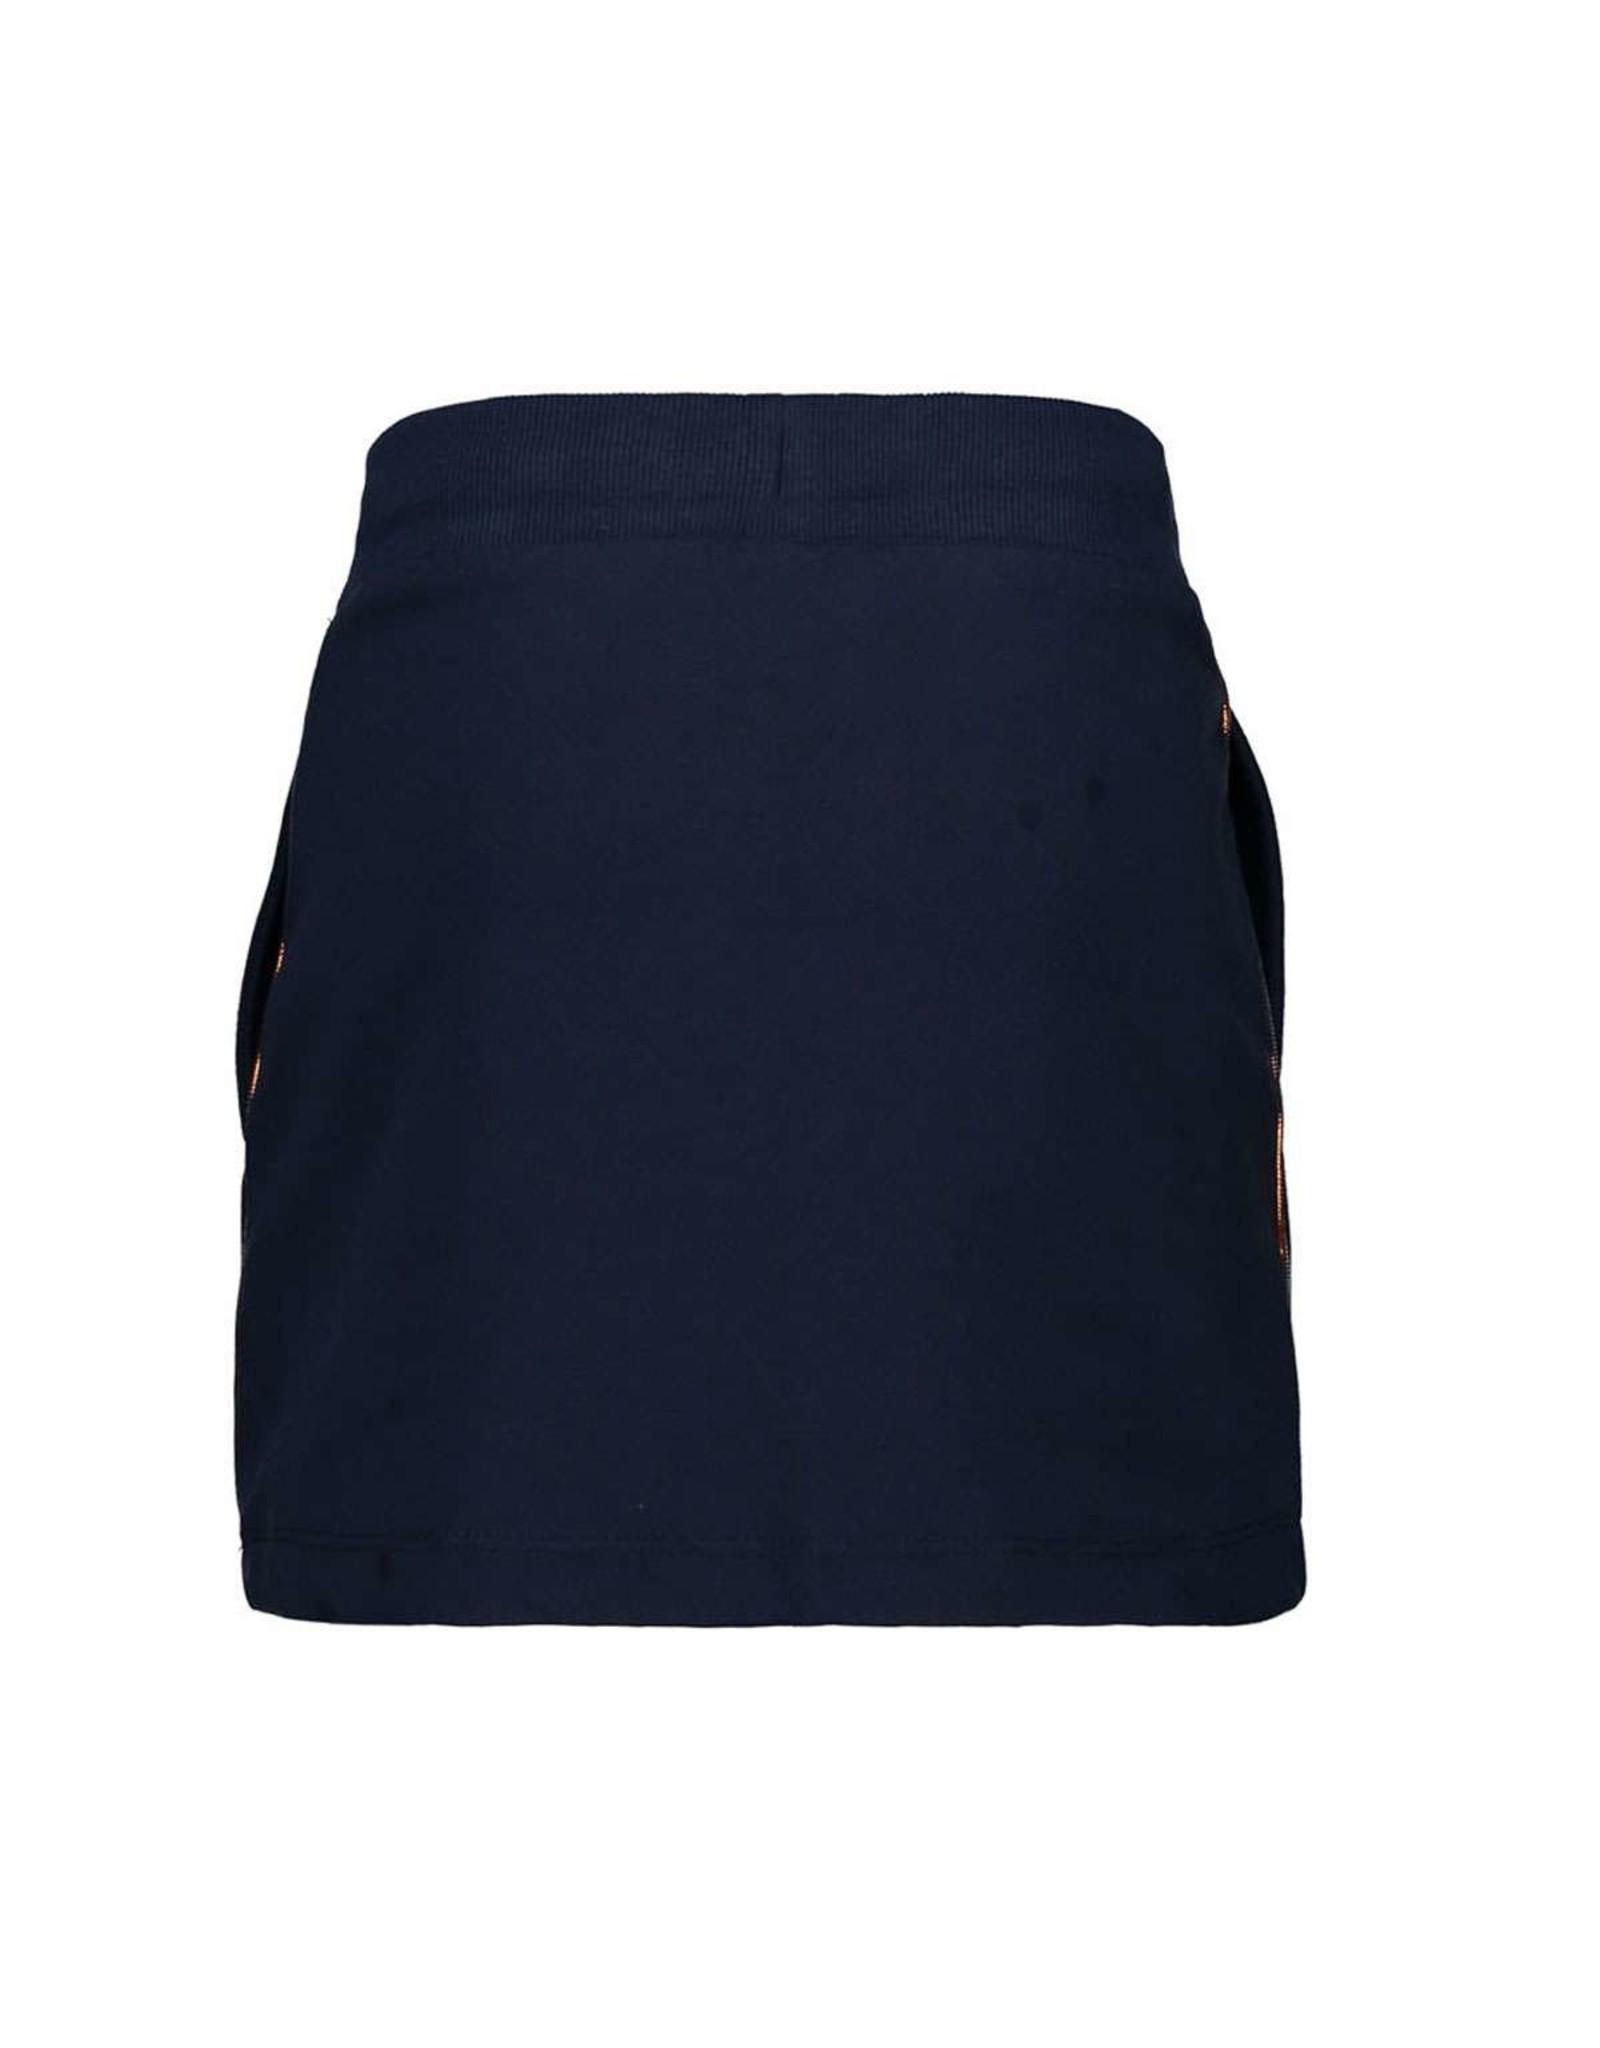 Moodstreet Moodstreet-MT Sweat Skirt-Navy